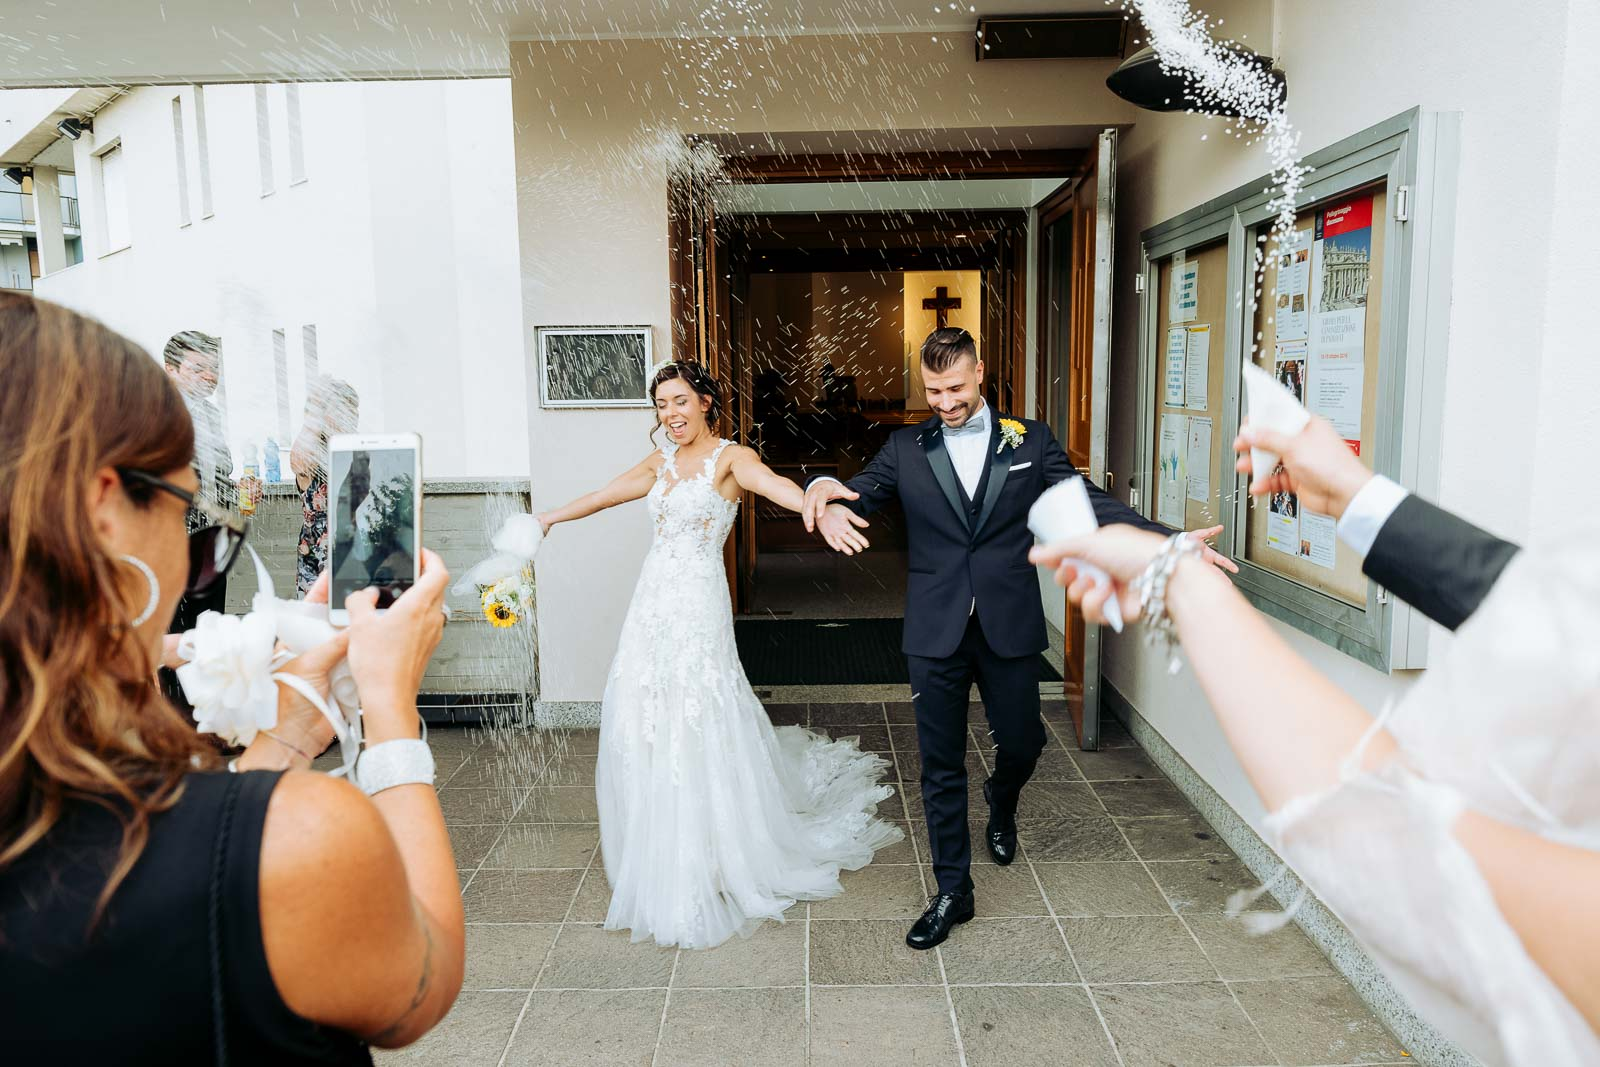 matrimonio brianza brugherio